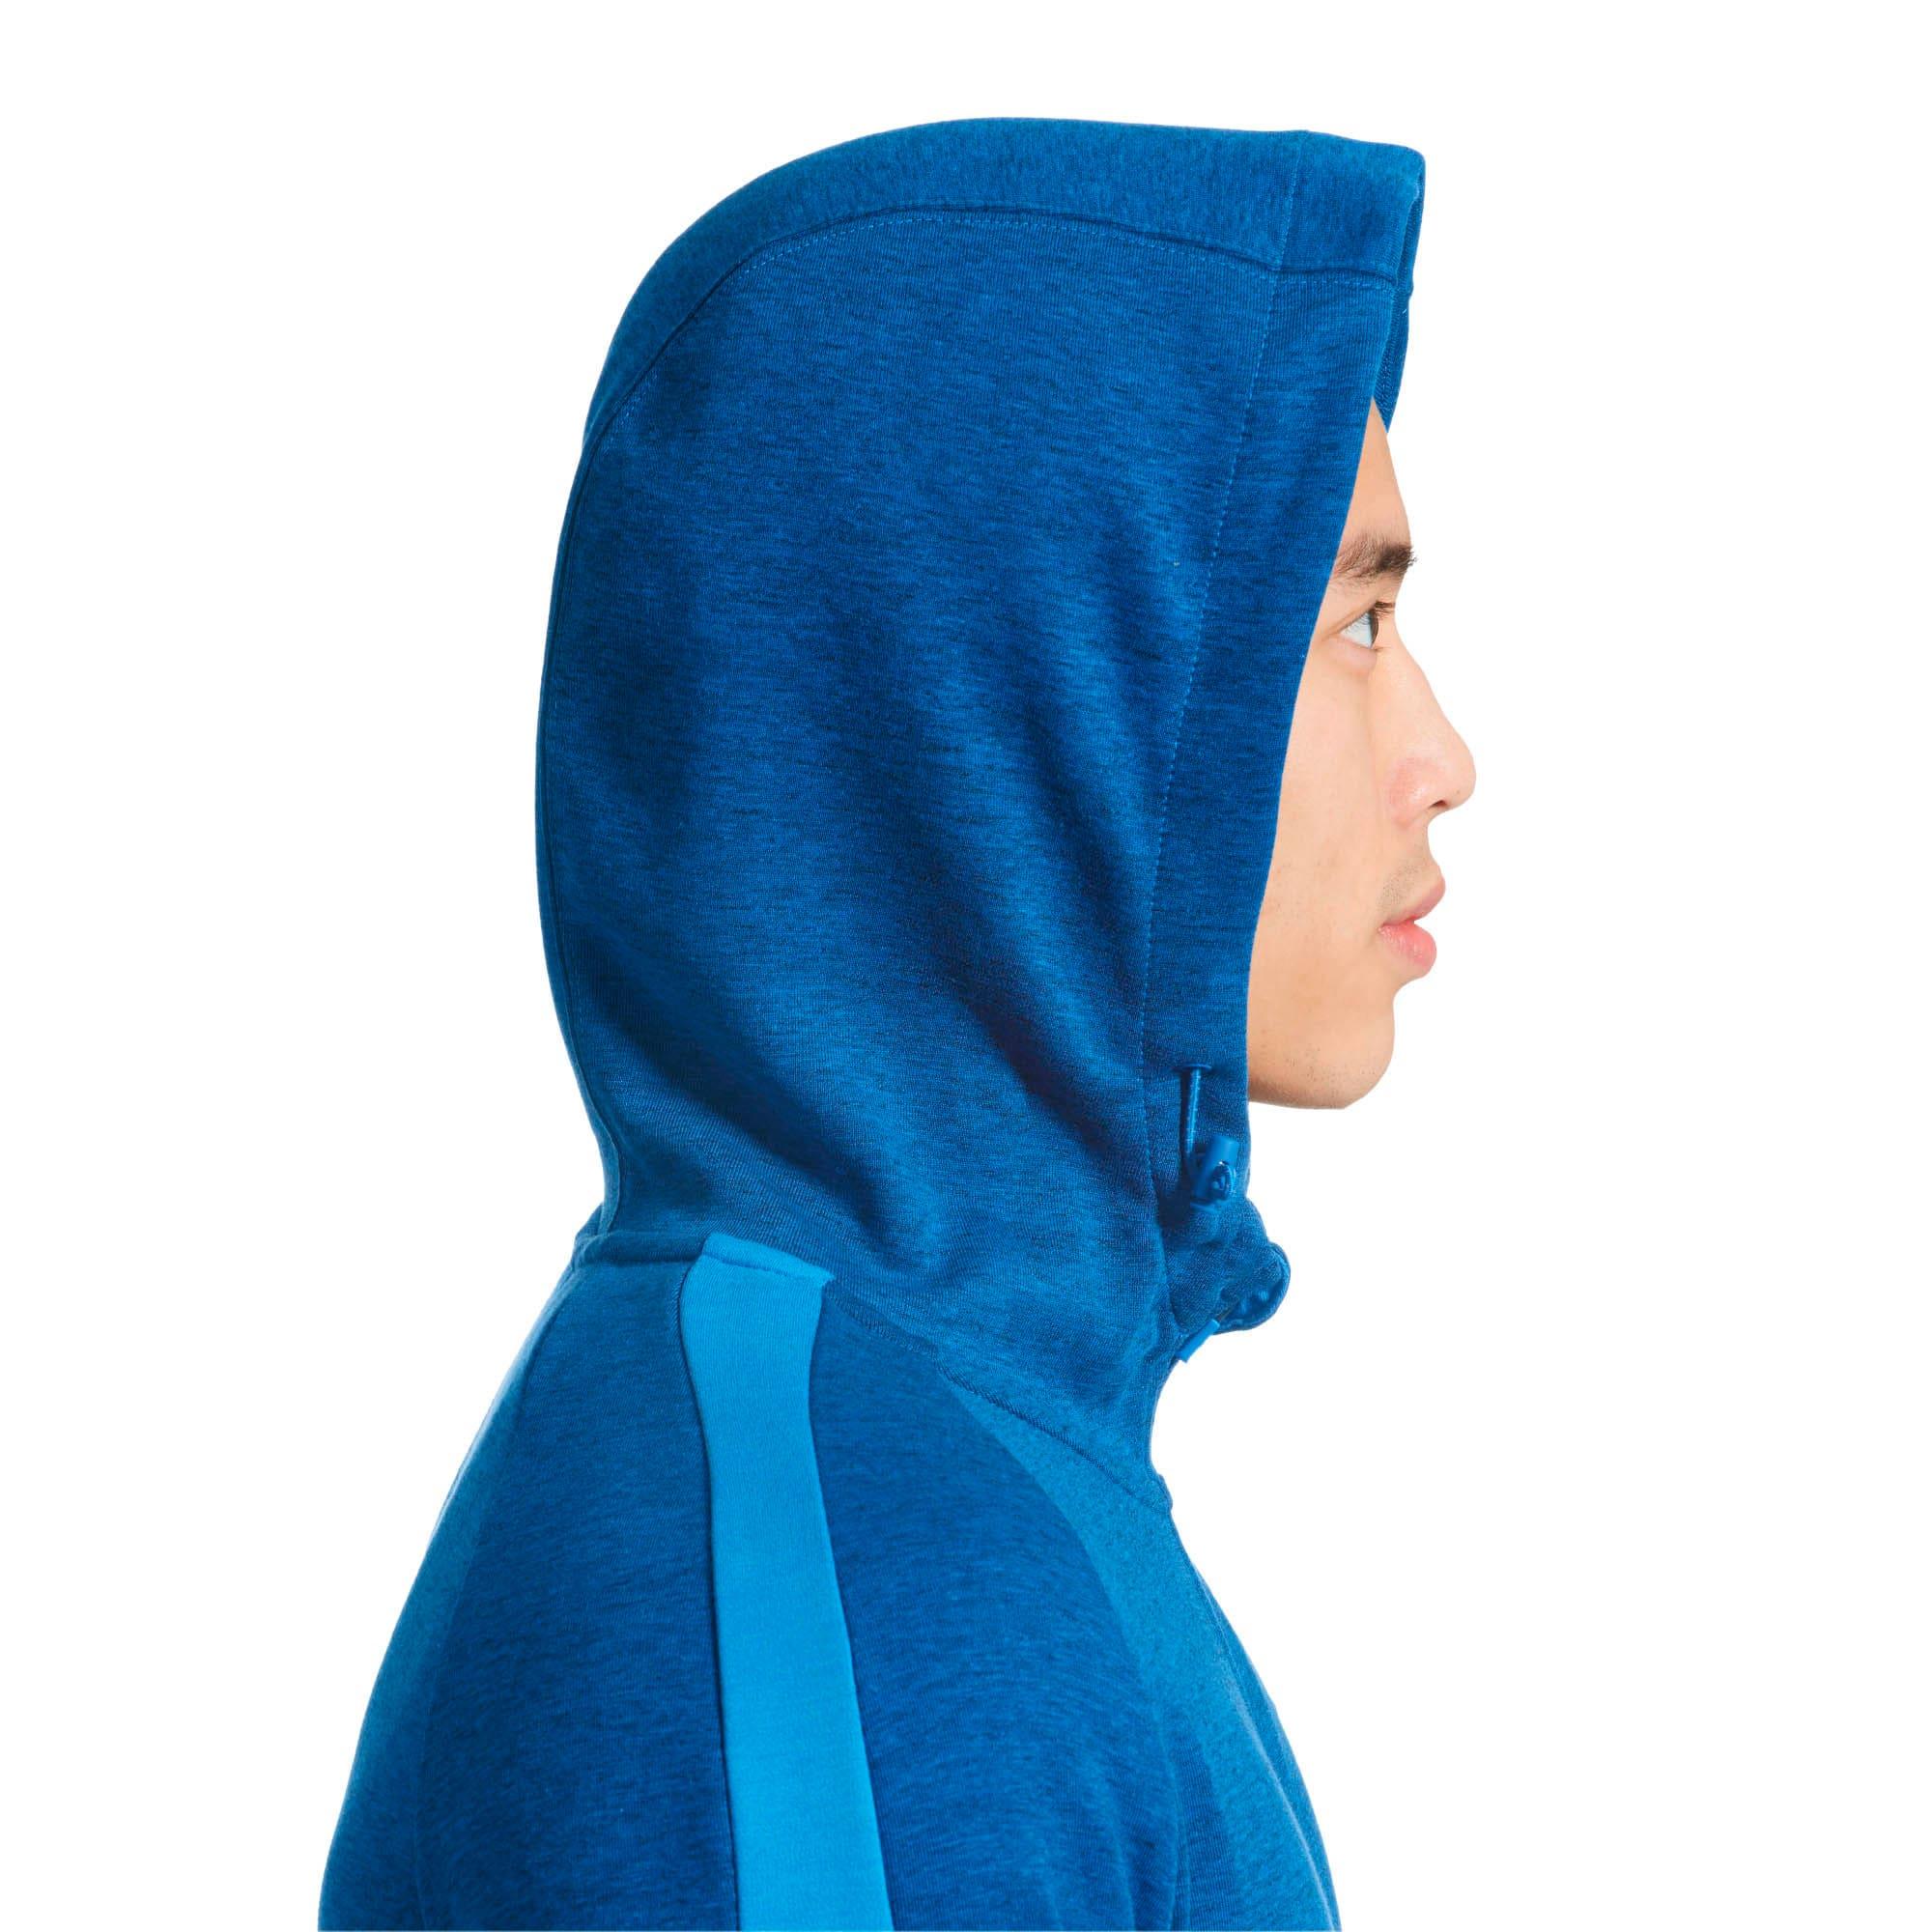 Thumbnail 2 of Evostripe Full Zip Men's Hoodie, Strong Blue Heather, medium